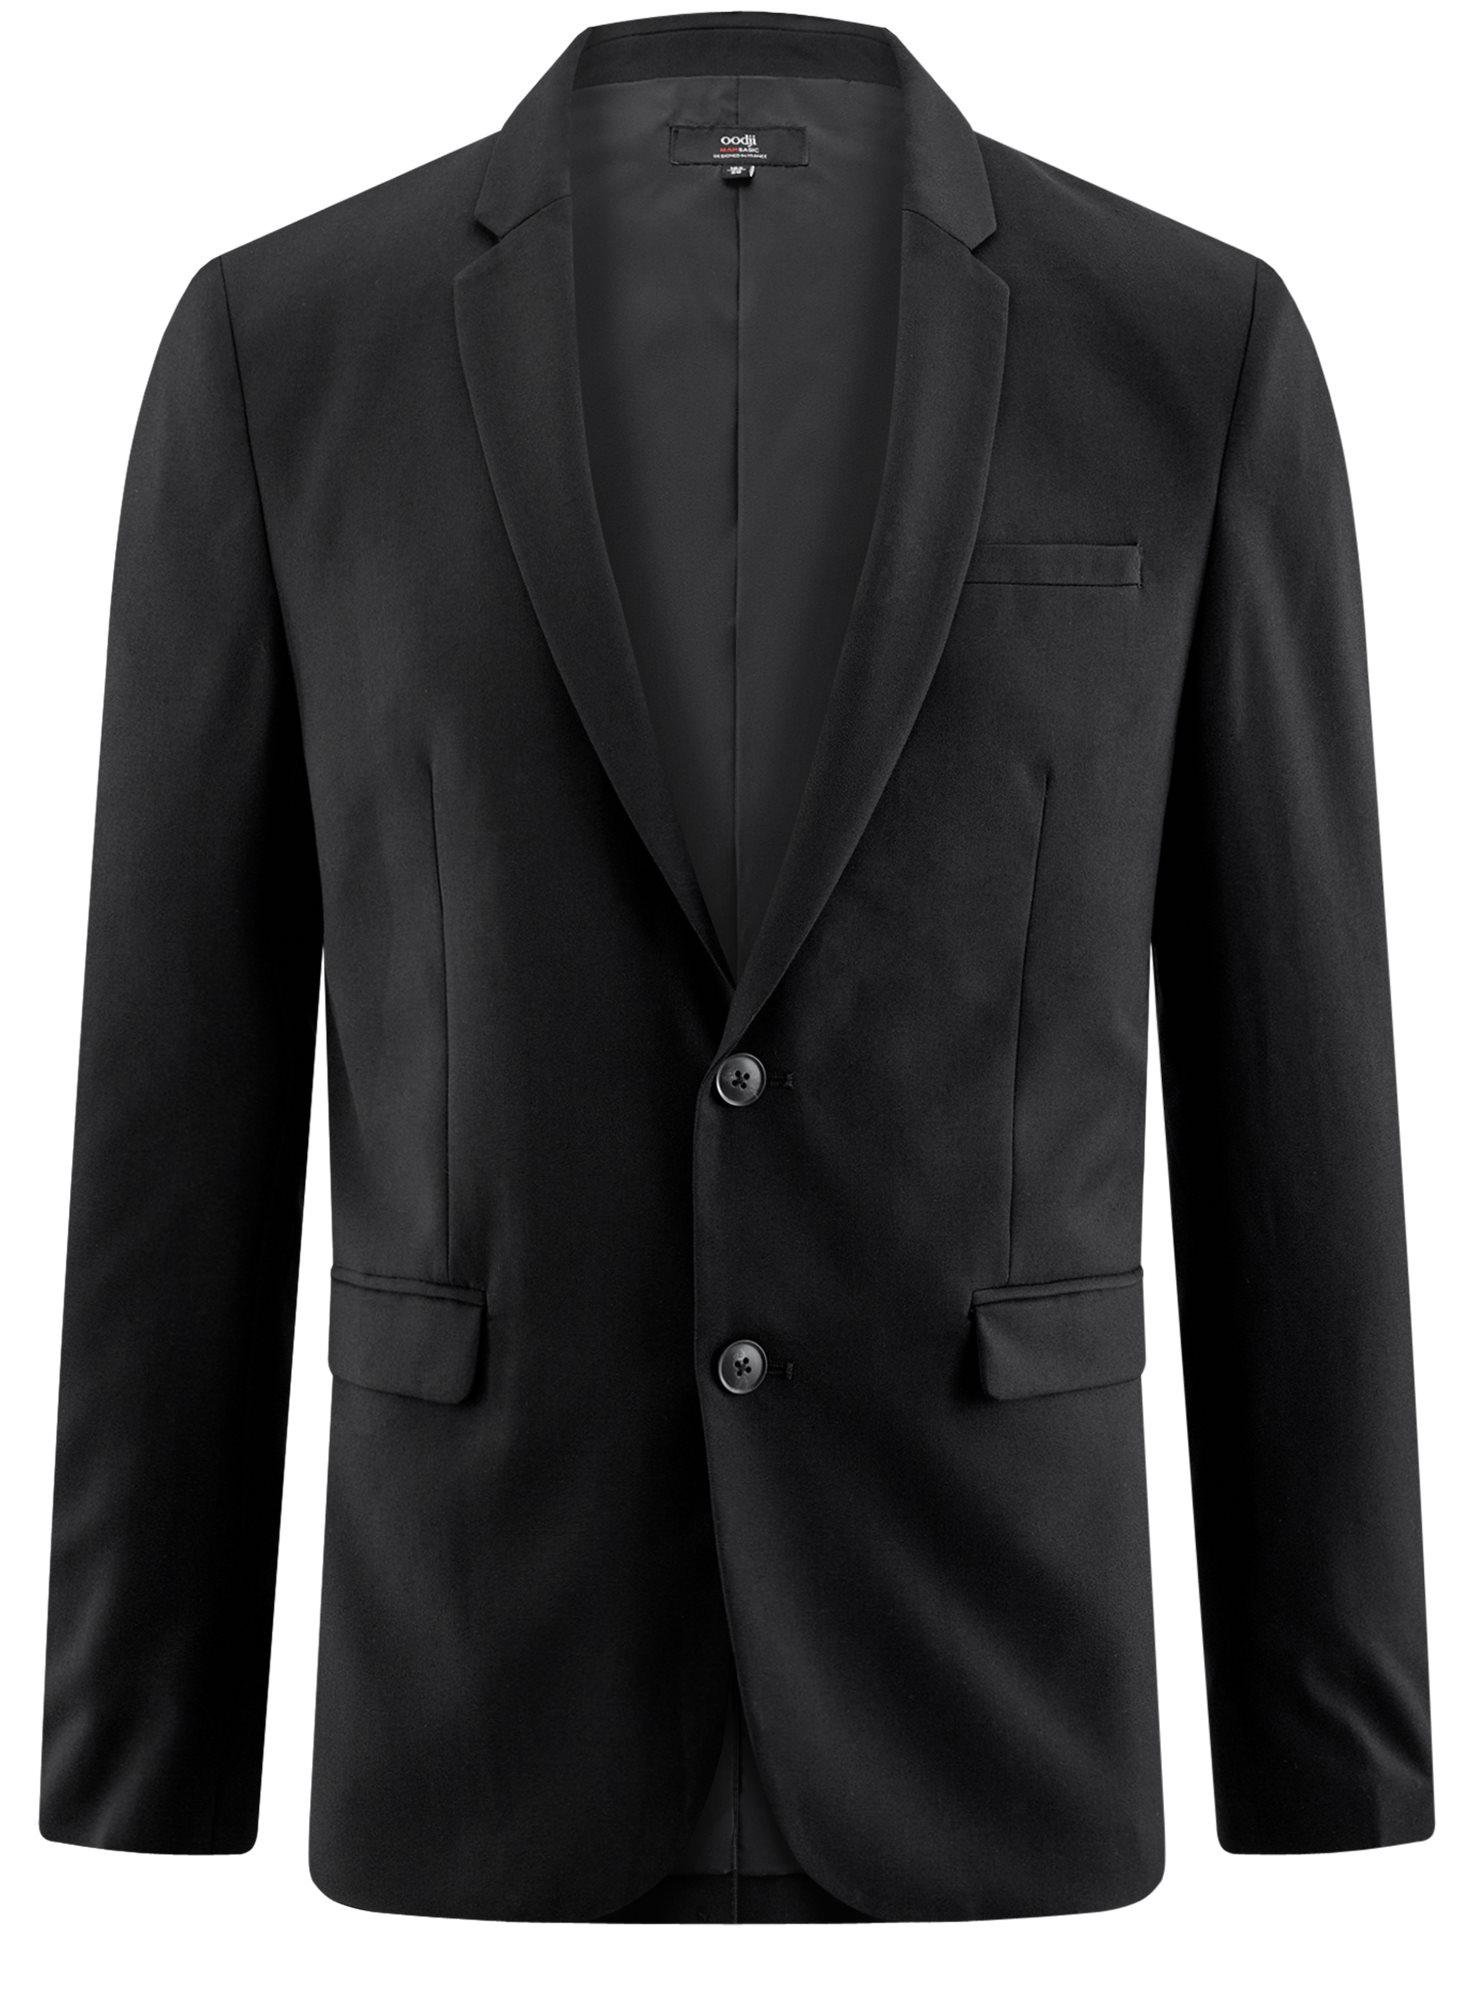 Пиджак классический oodji для мужчины (черный), 2B420016M/46317N/2900N